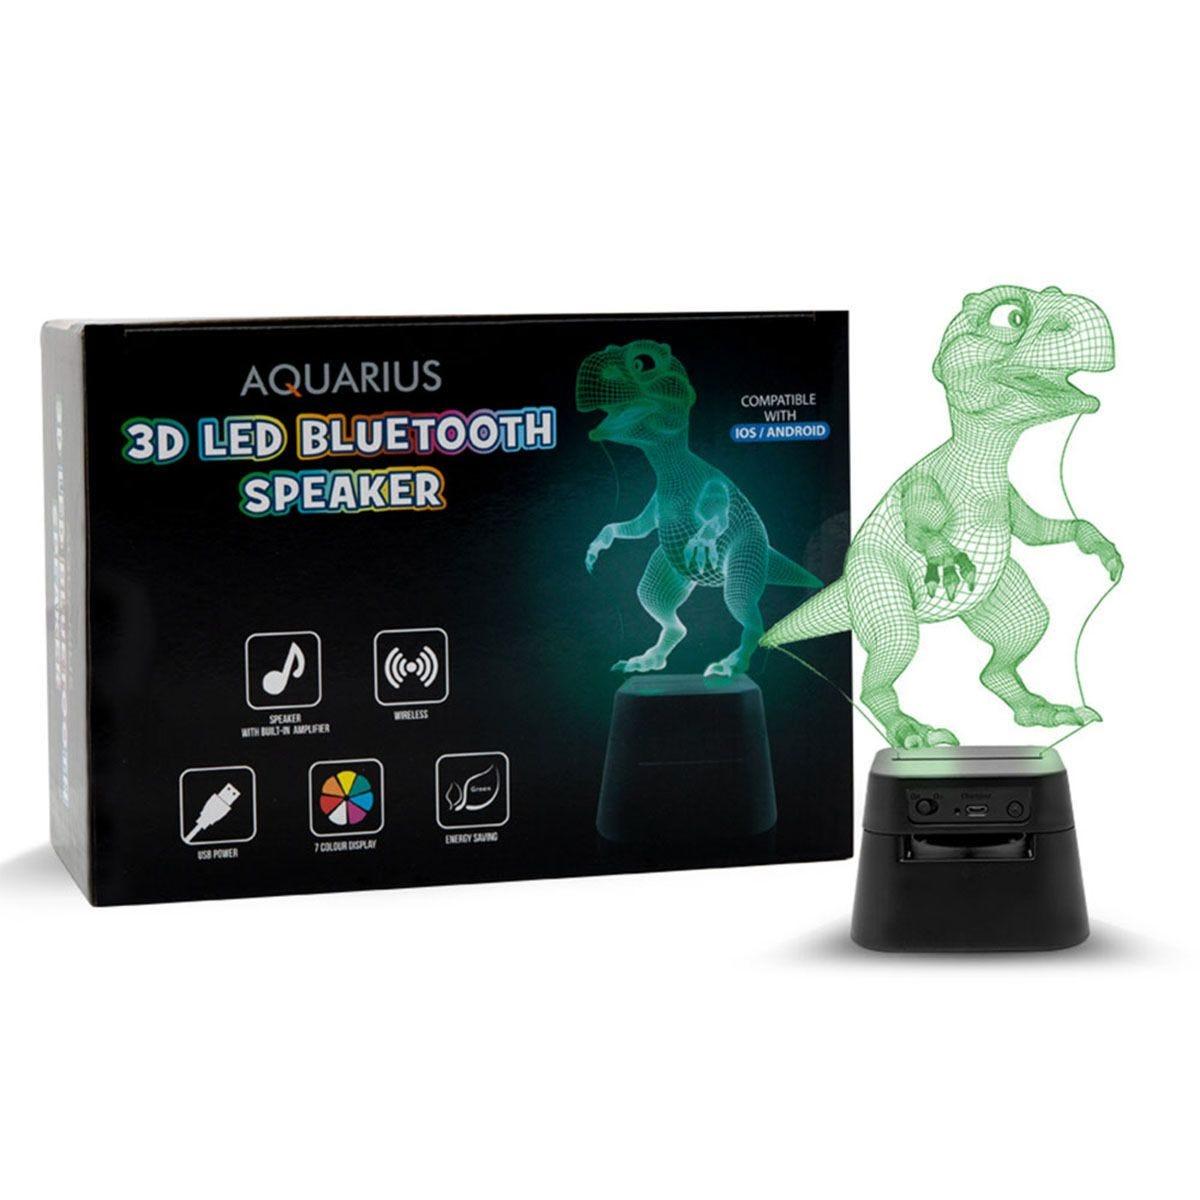 Aquarius 3D Led Bluetooth speaker - Dinosaur Hologram Led Lamp